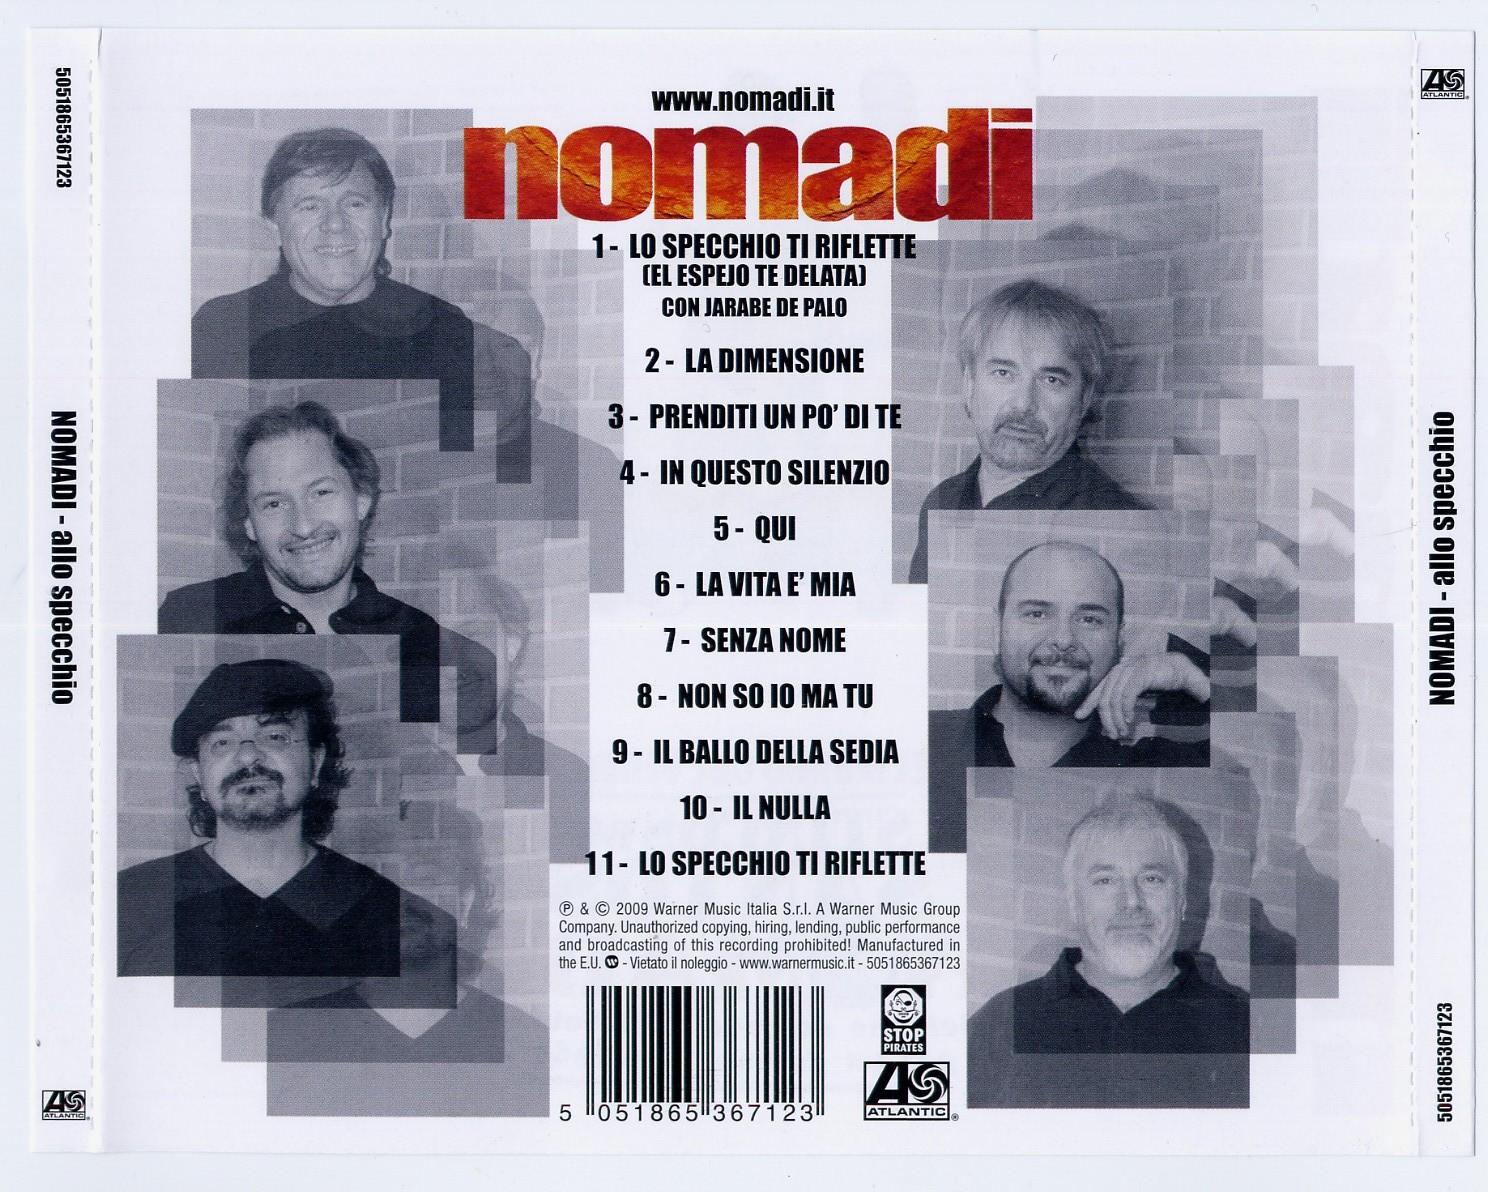 Musica su nomadi in studio - Lo specchio della vita torrent ...